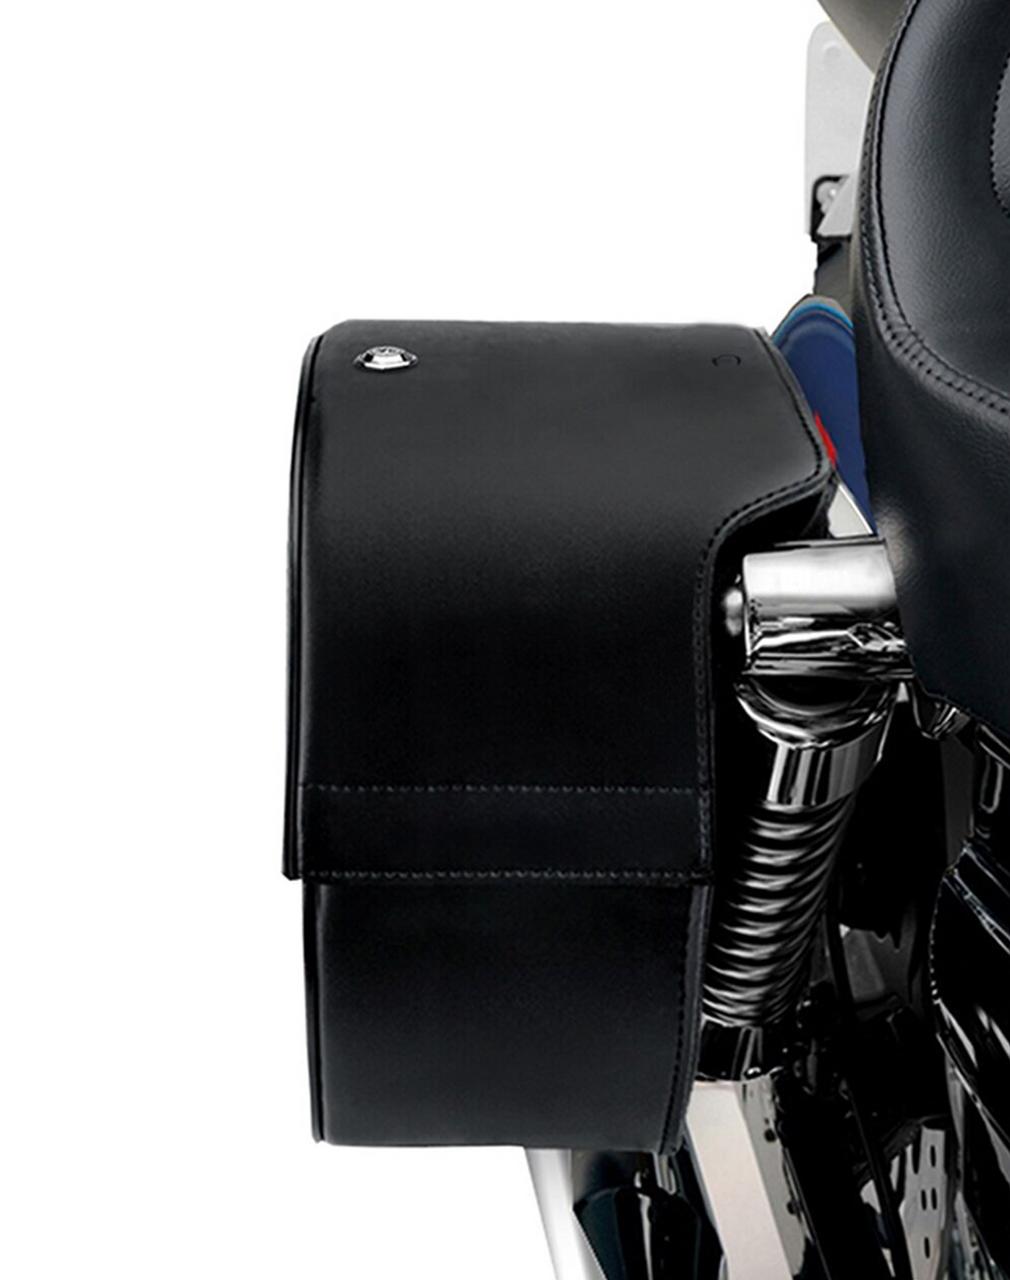 Honda VTX 1800 N Warrior Shock Cutout Slanted Motorcycle Saddlebags Shock Cutout View